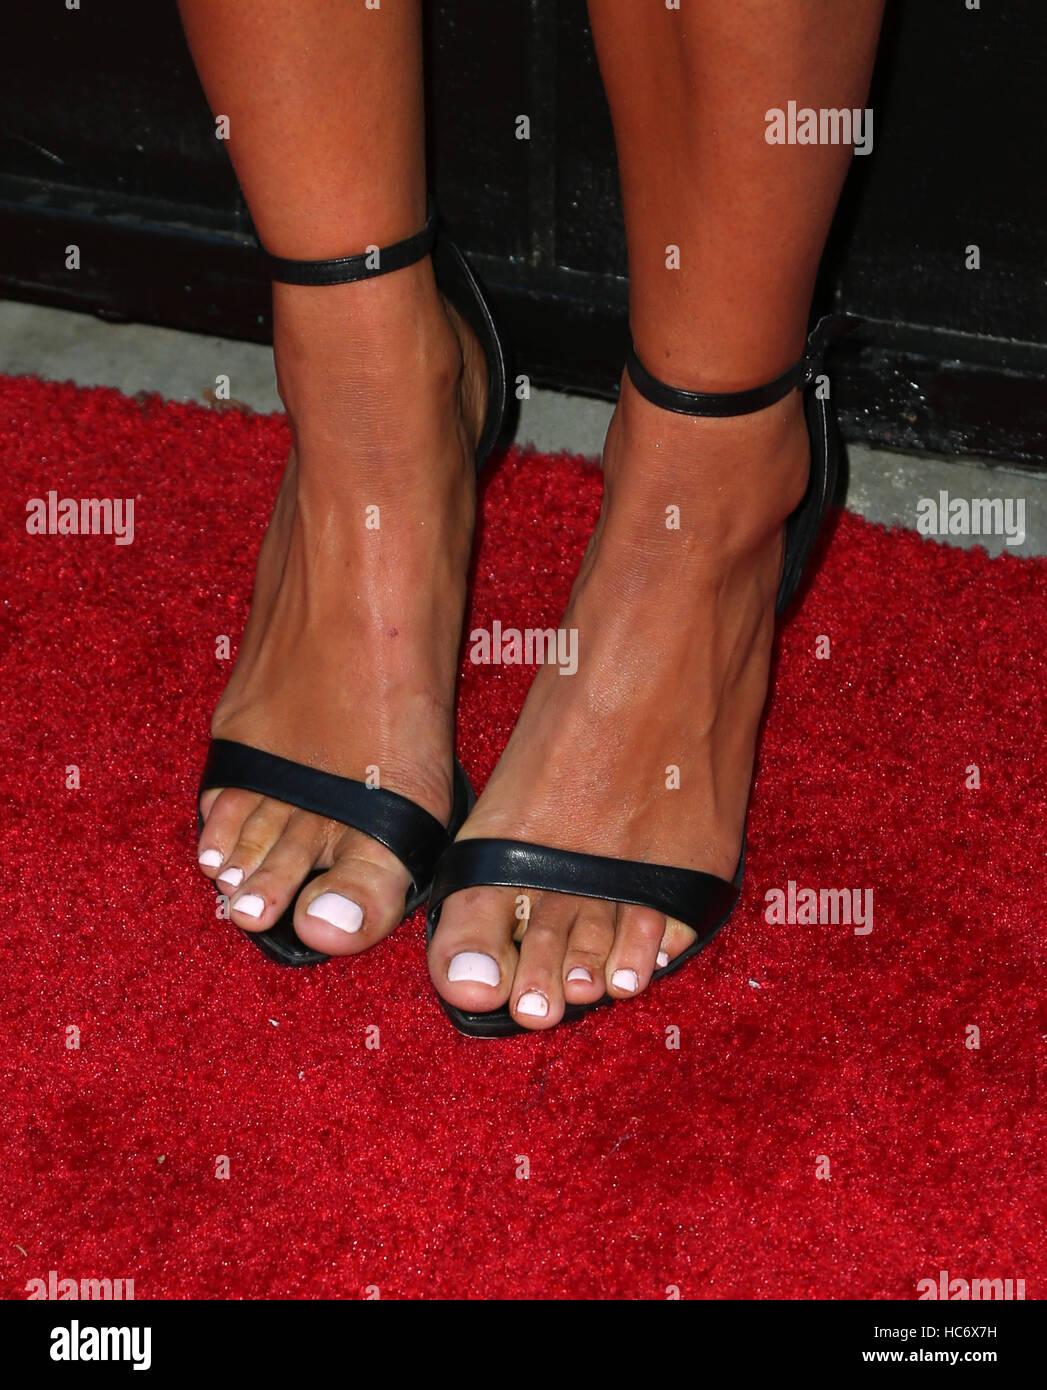 Feet Jacqueline MacInnes nude photos 2019